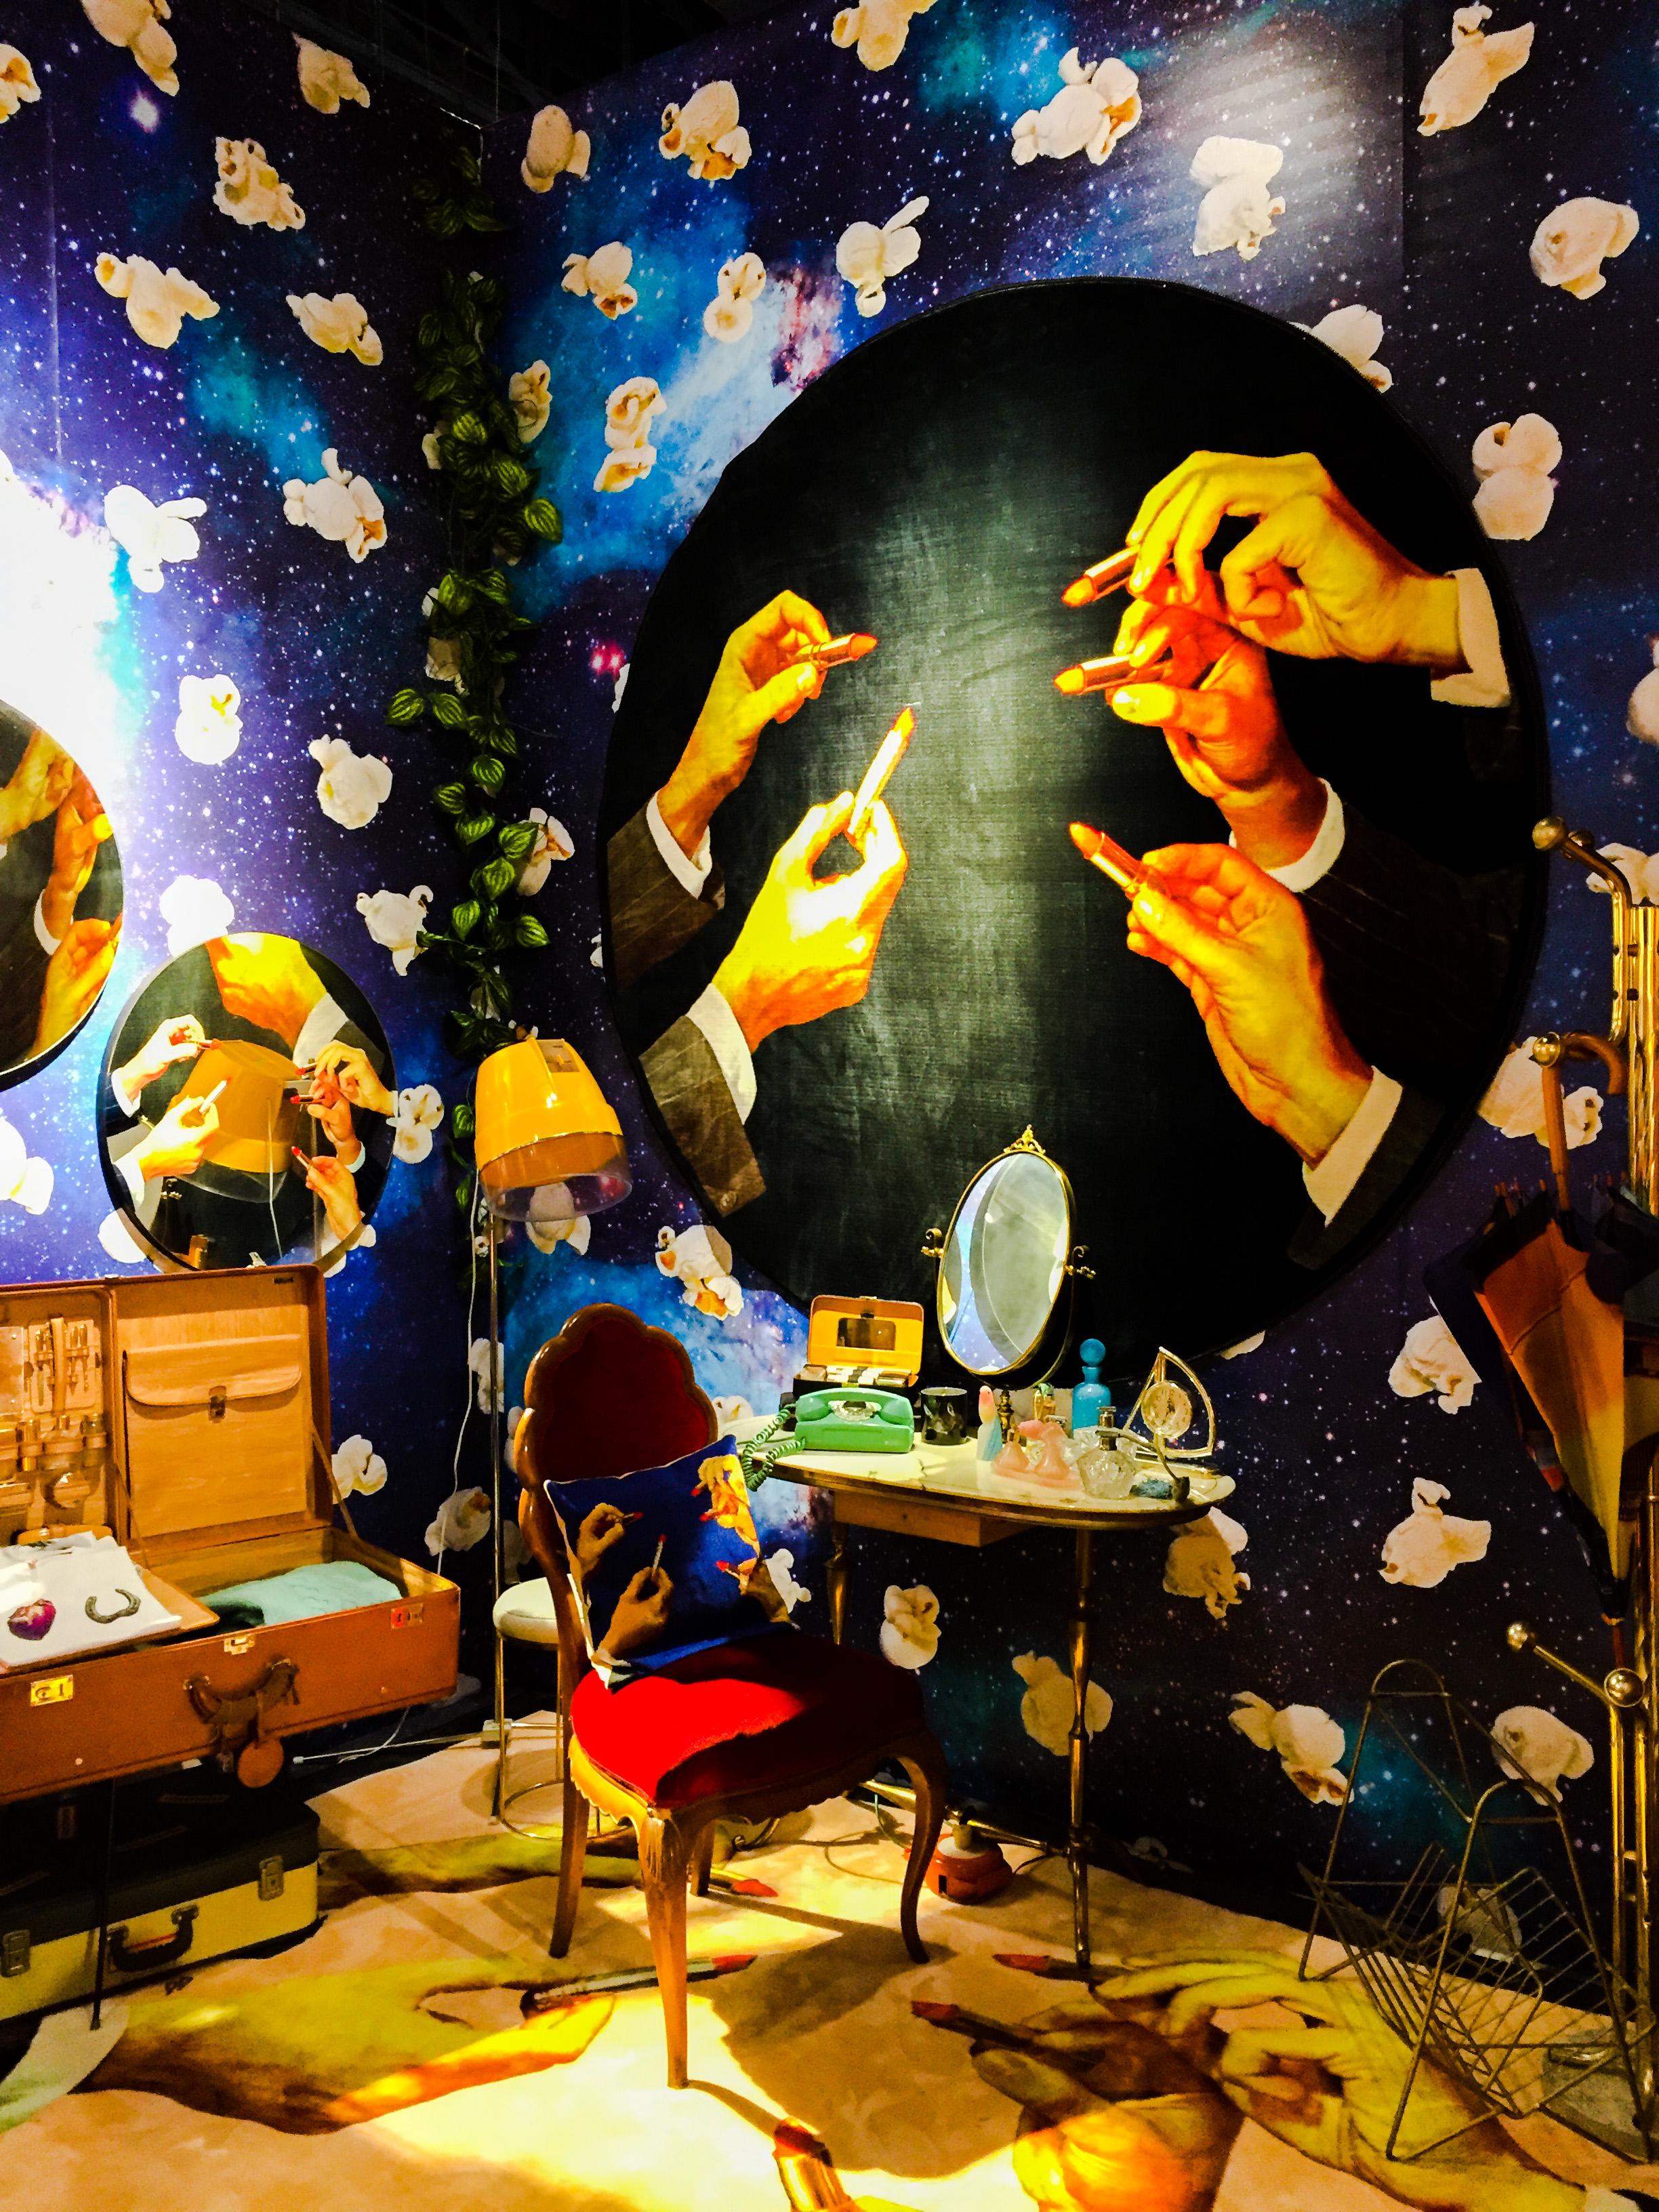 A complete room installation. I call it Fantasy Bedroom.